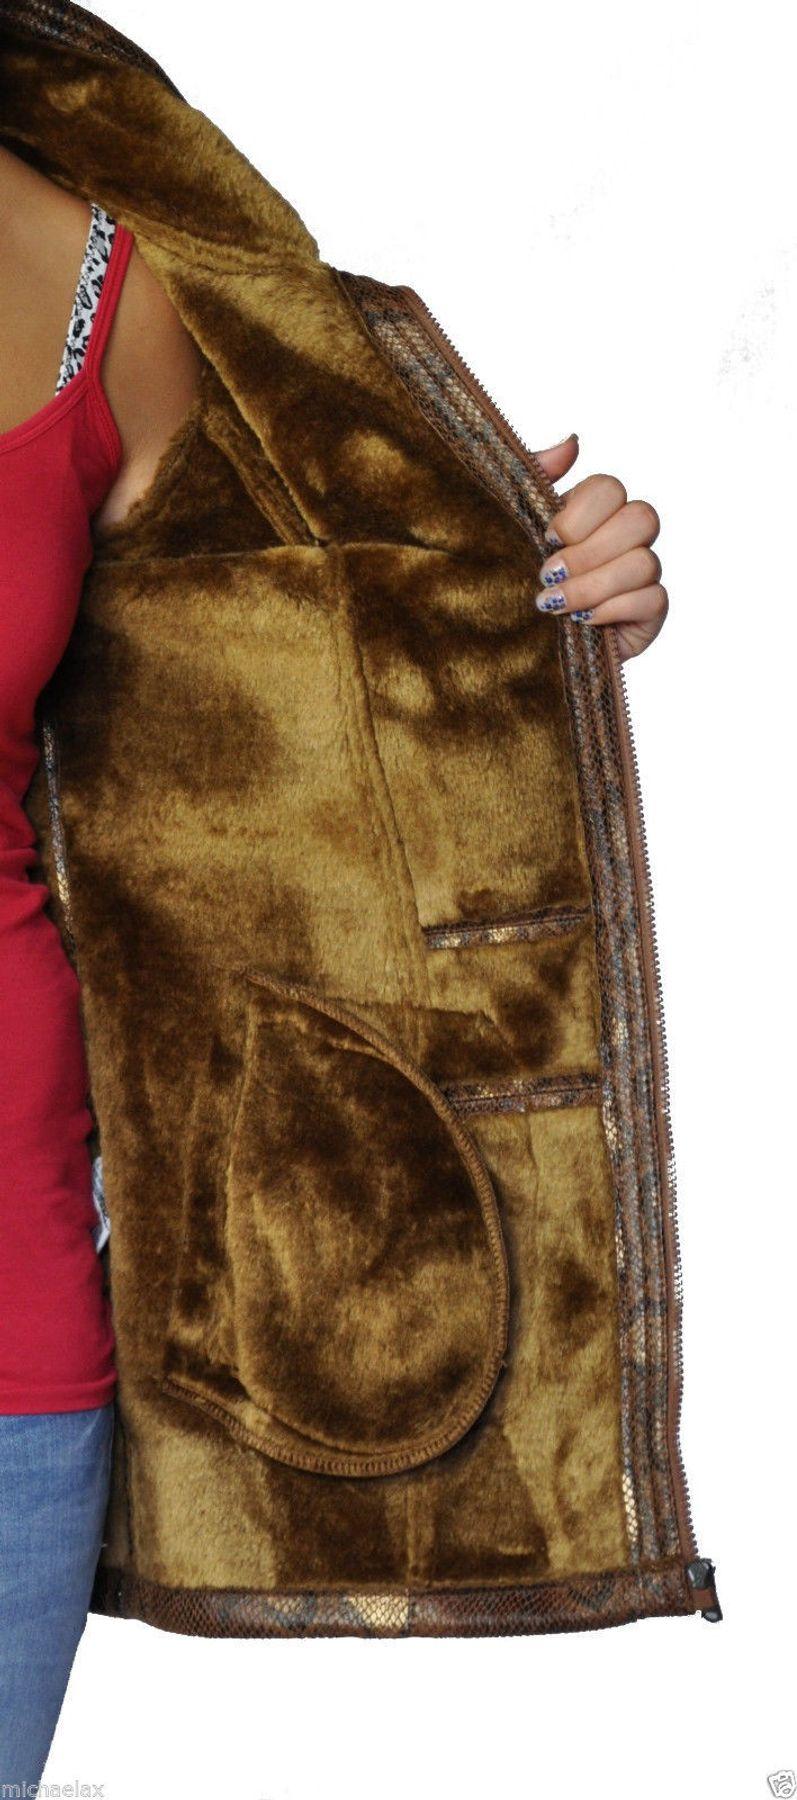 Damen Webpelz Jacke in Snakeprint, Farbe braun Artikel Oriane – Bild 2